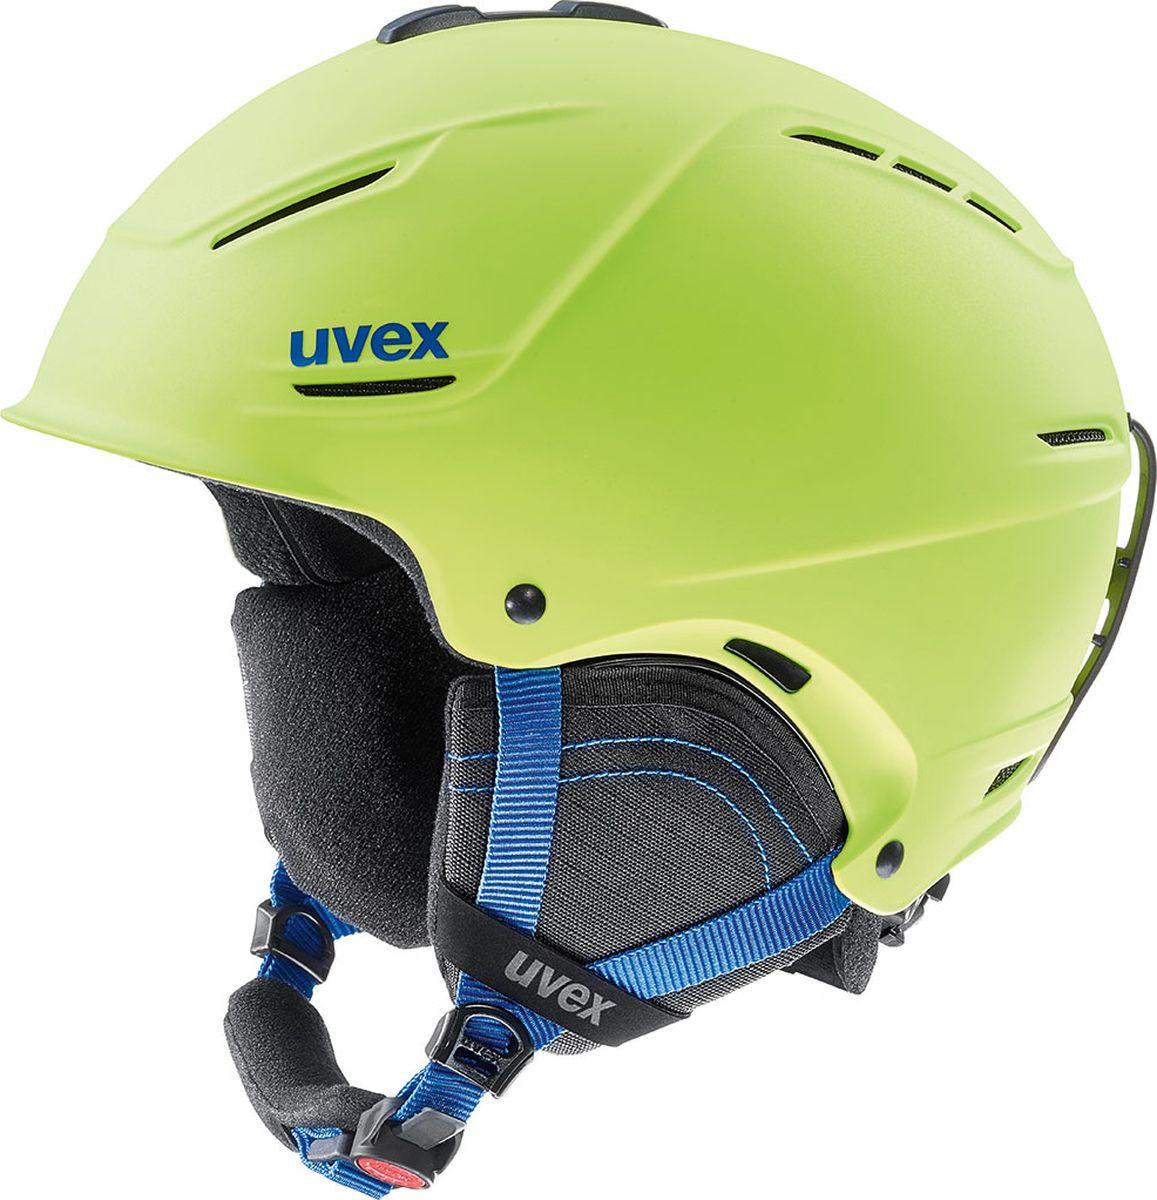 "Шлем горнолыжный Uvex ""P1us 2.0 Helmet"", цвет: лайм матовый. Размер 59/62"